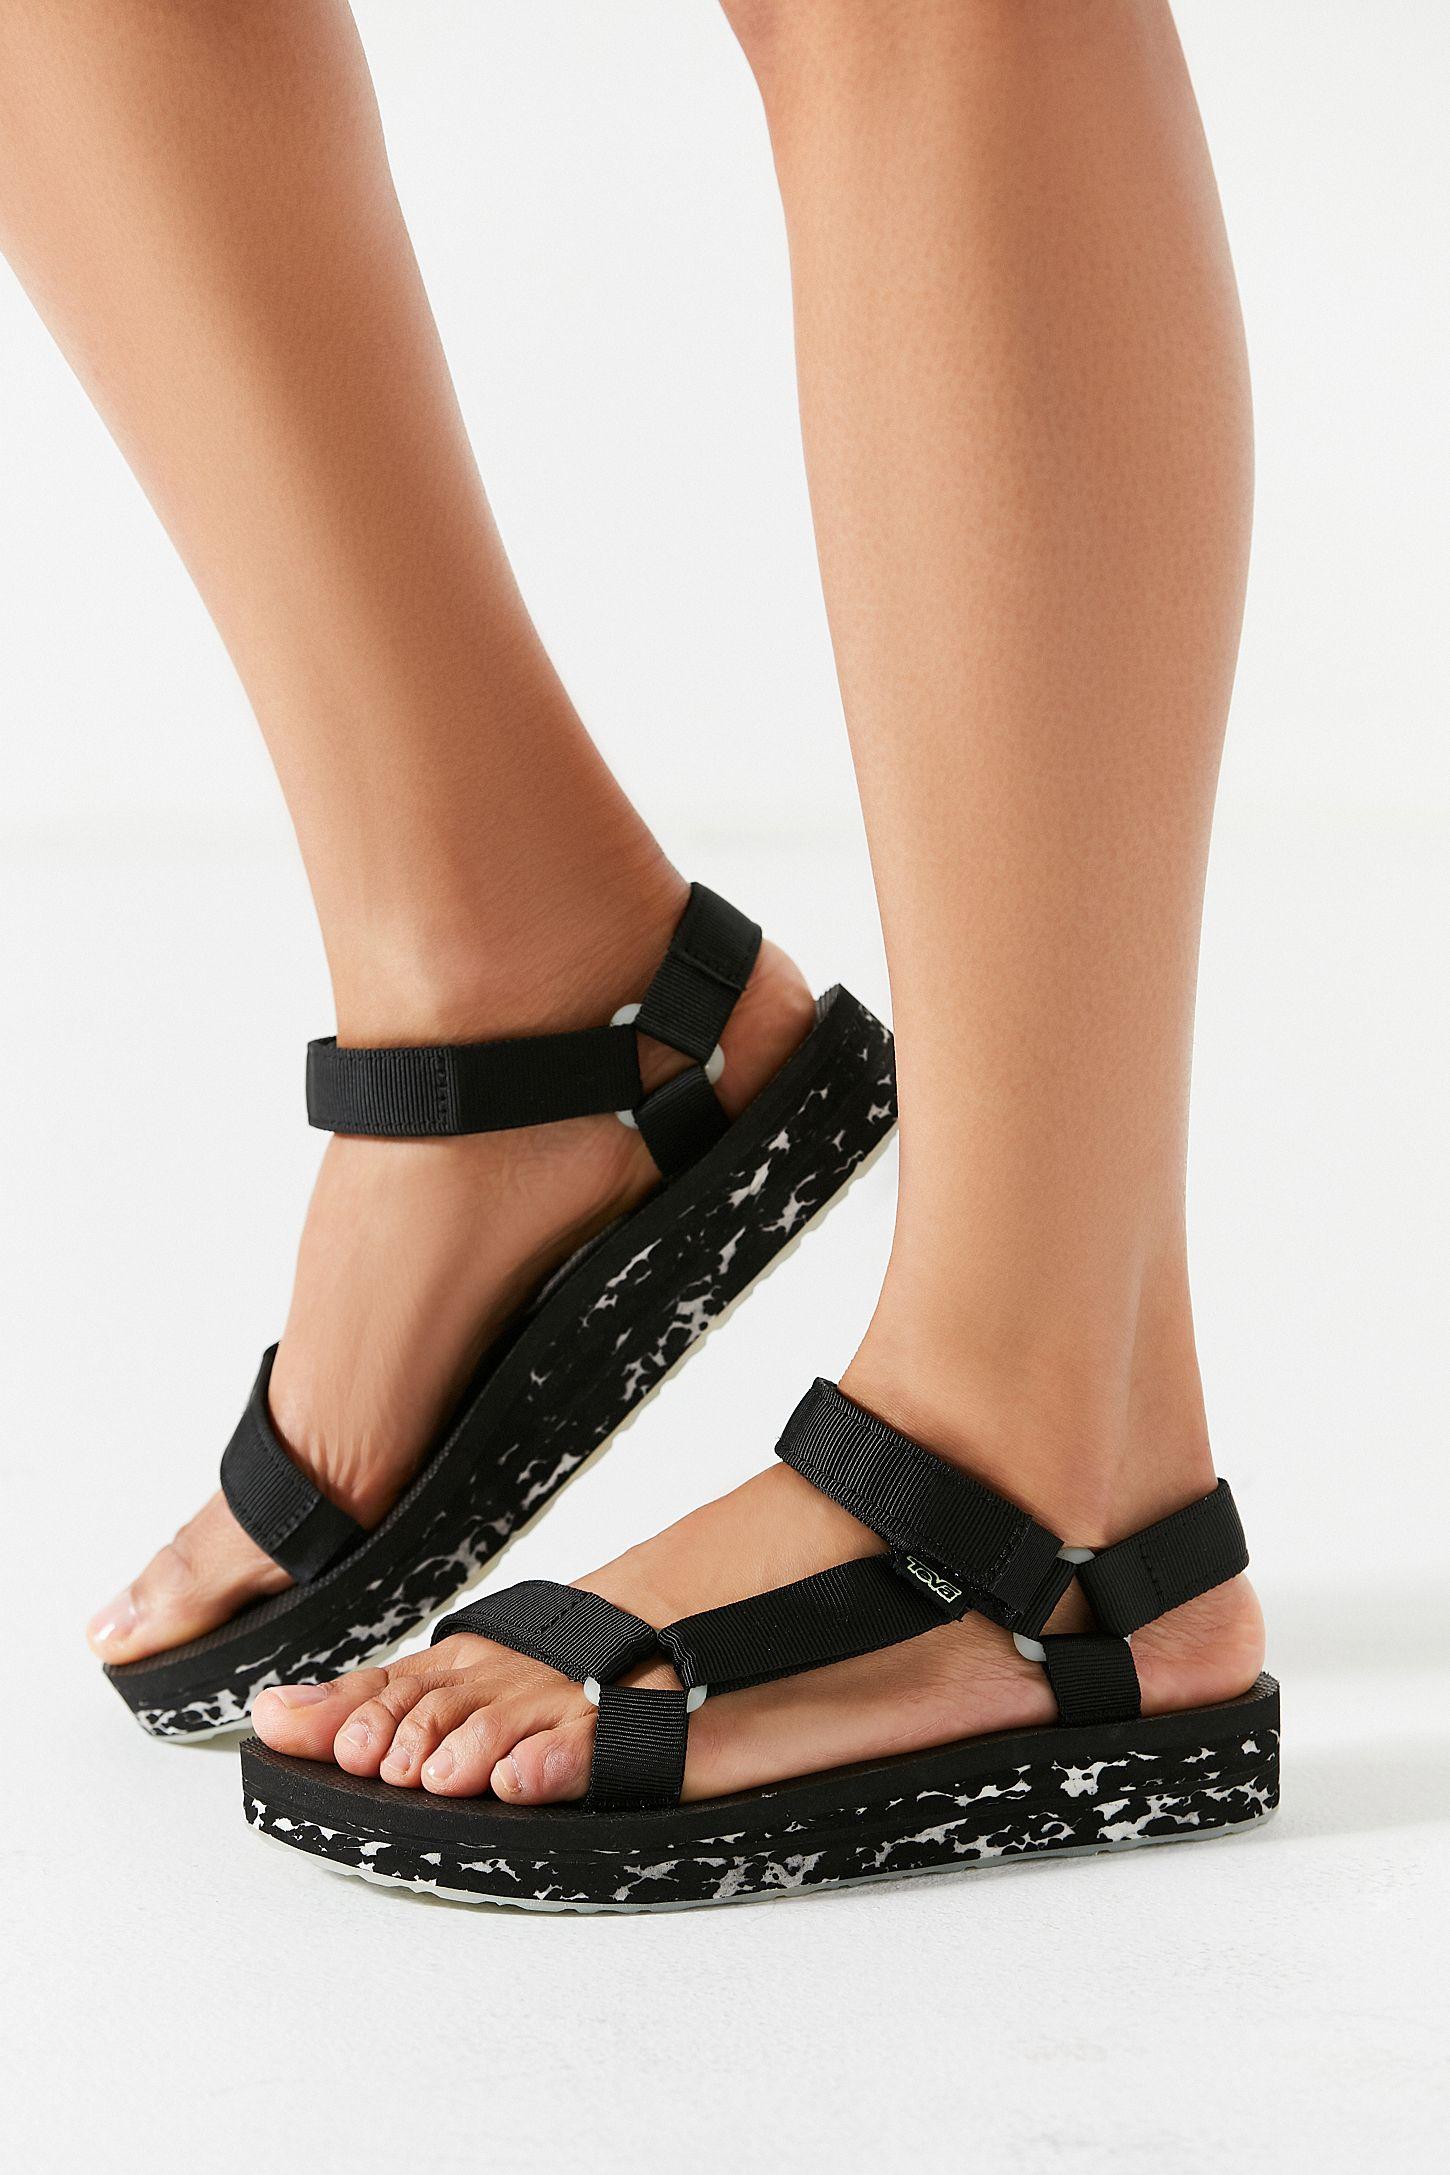 b8ad3c0e6 Teva Universal Glow-In-The-Dark Midform Sandal